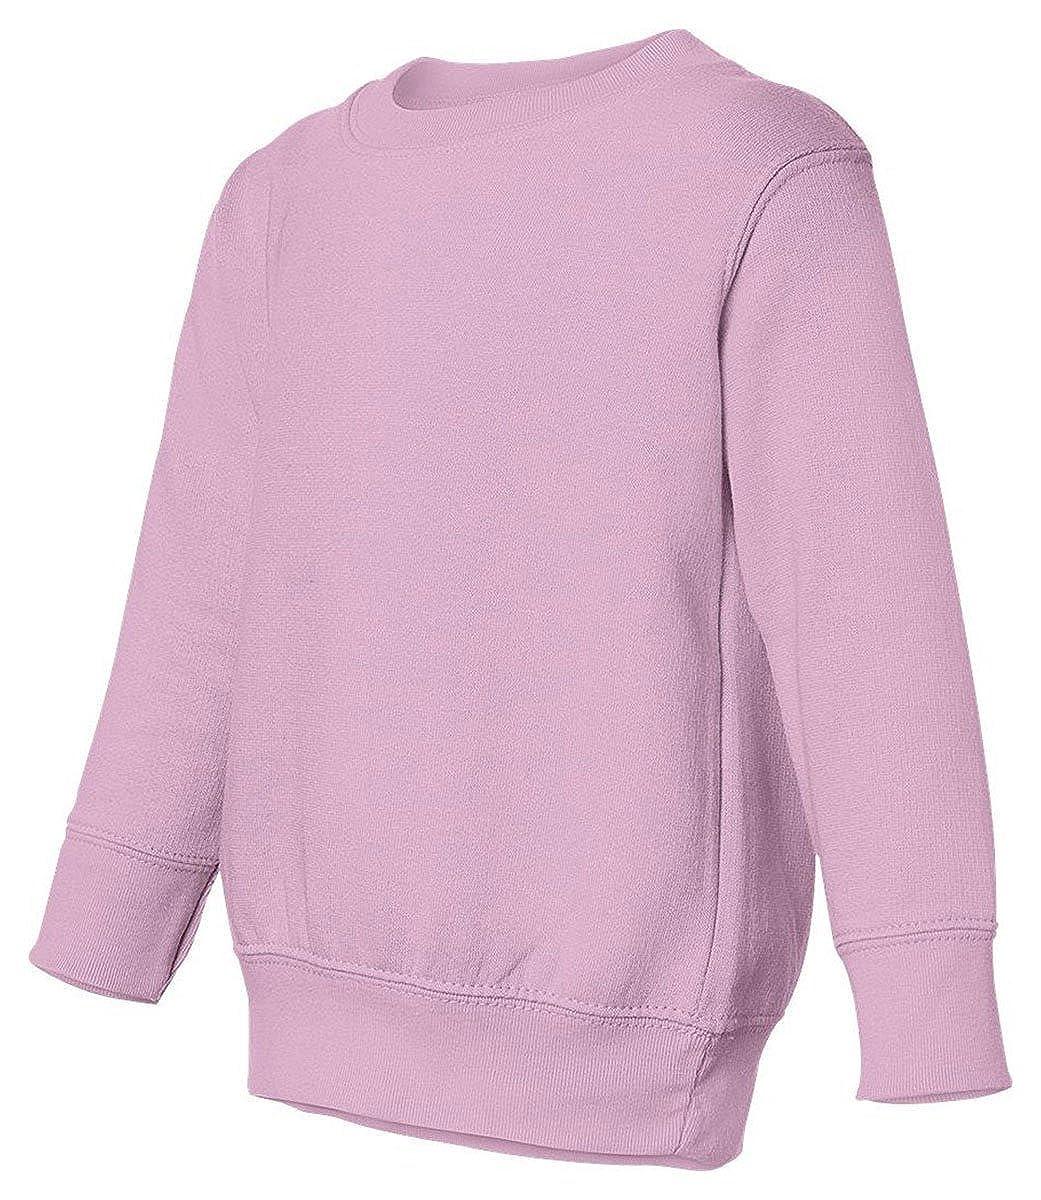 Rabbit Skins 3317 Toddler Fleece Crewnneck Sweatshirt